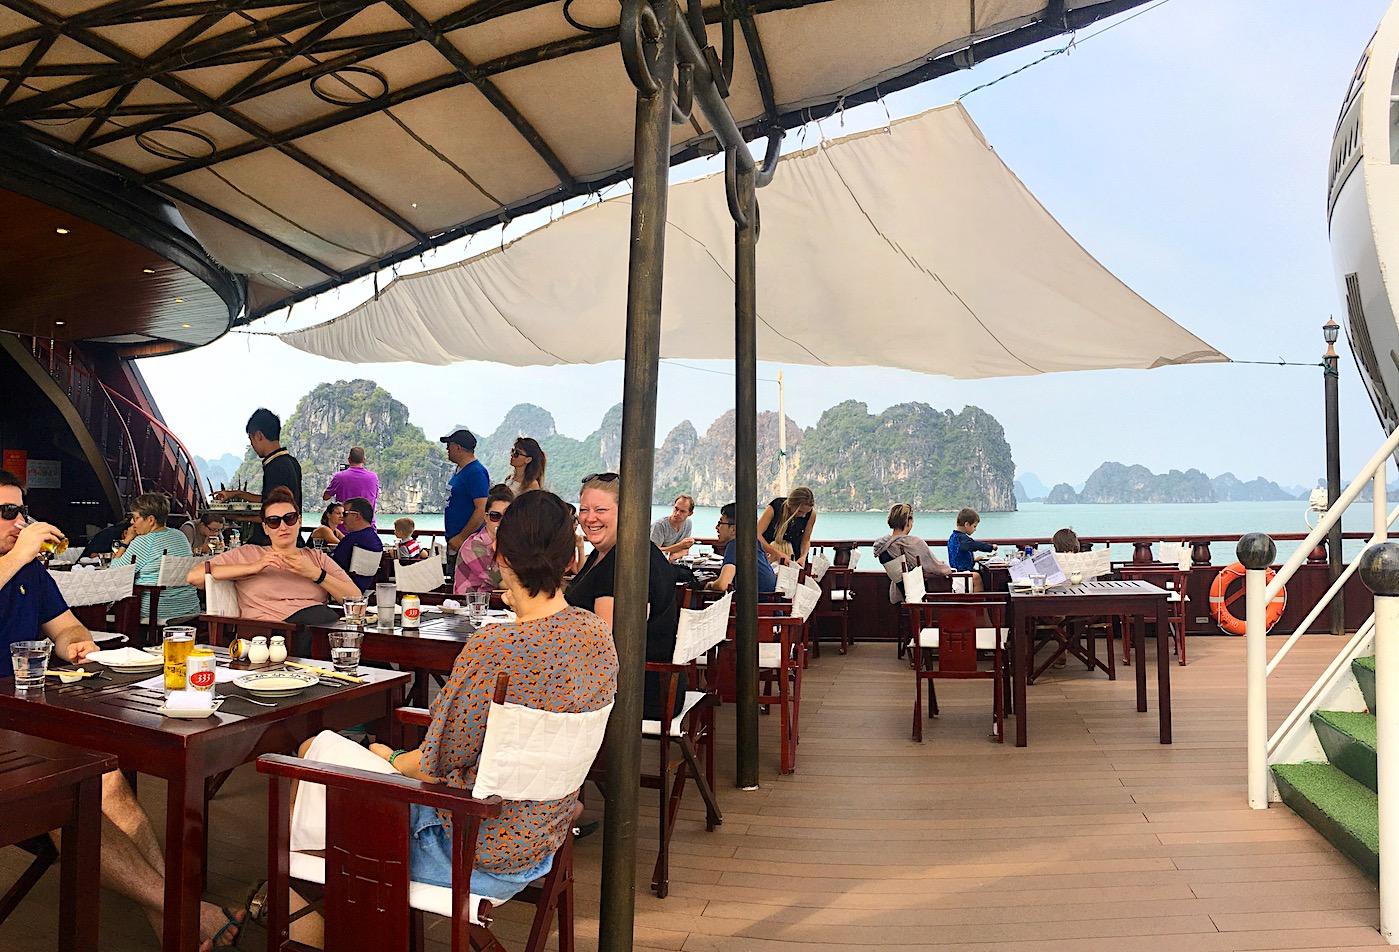 Dragon Legend Cruise, Bai Tu Long, Vietnam. Photo: Patti Neves